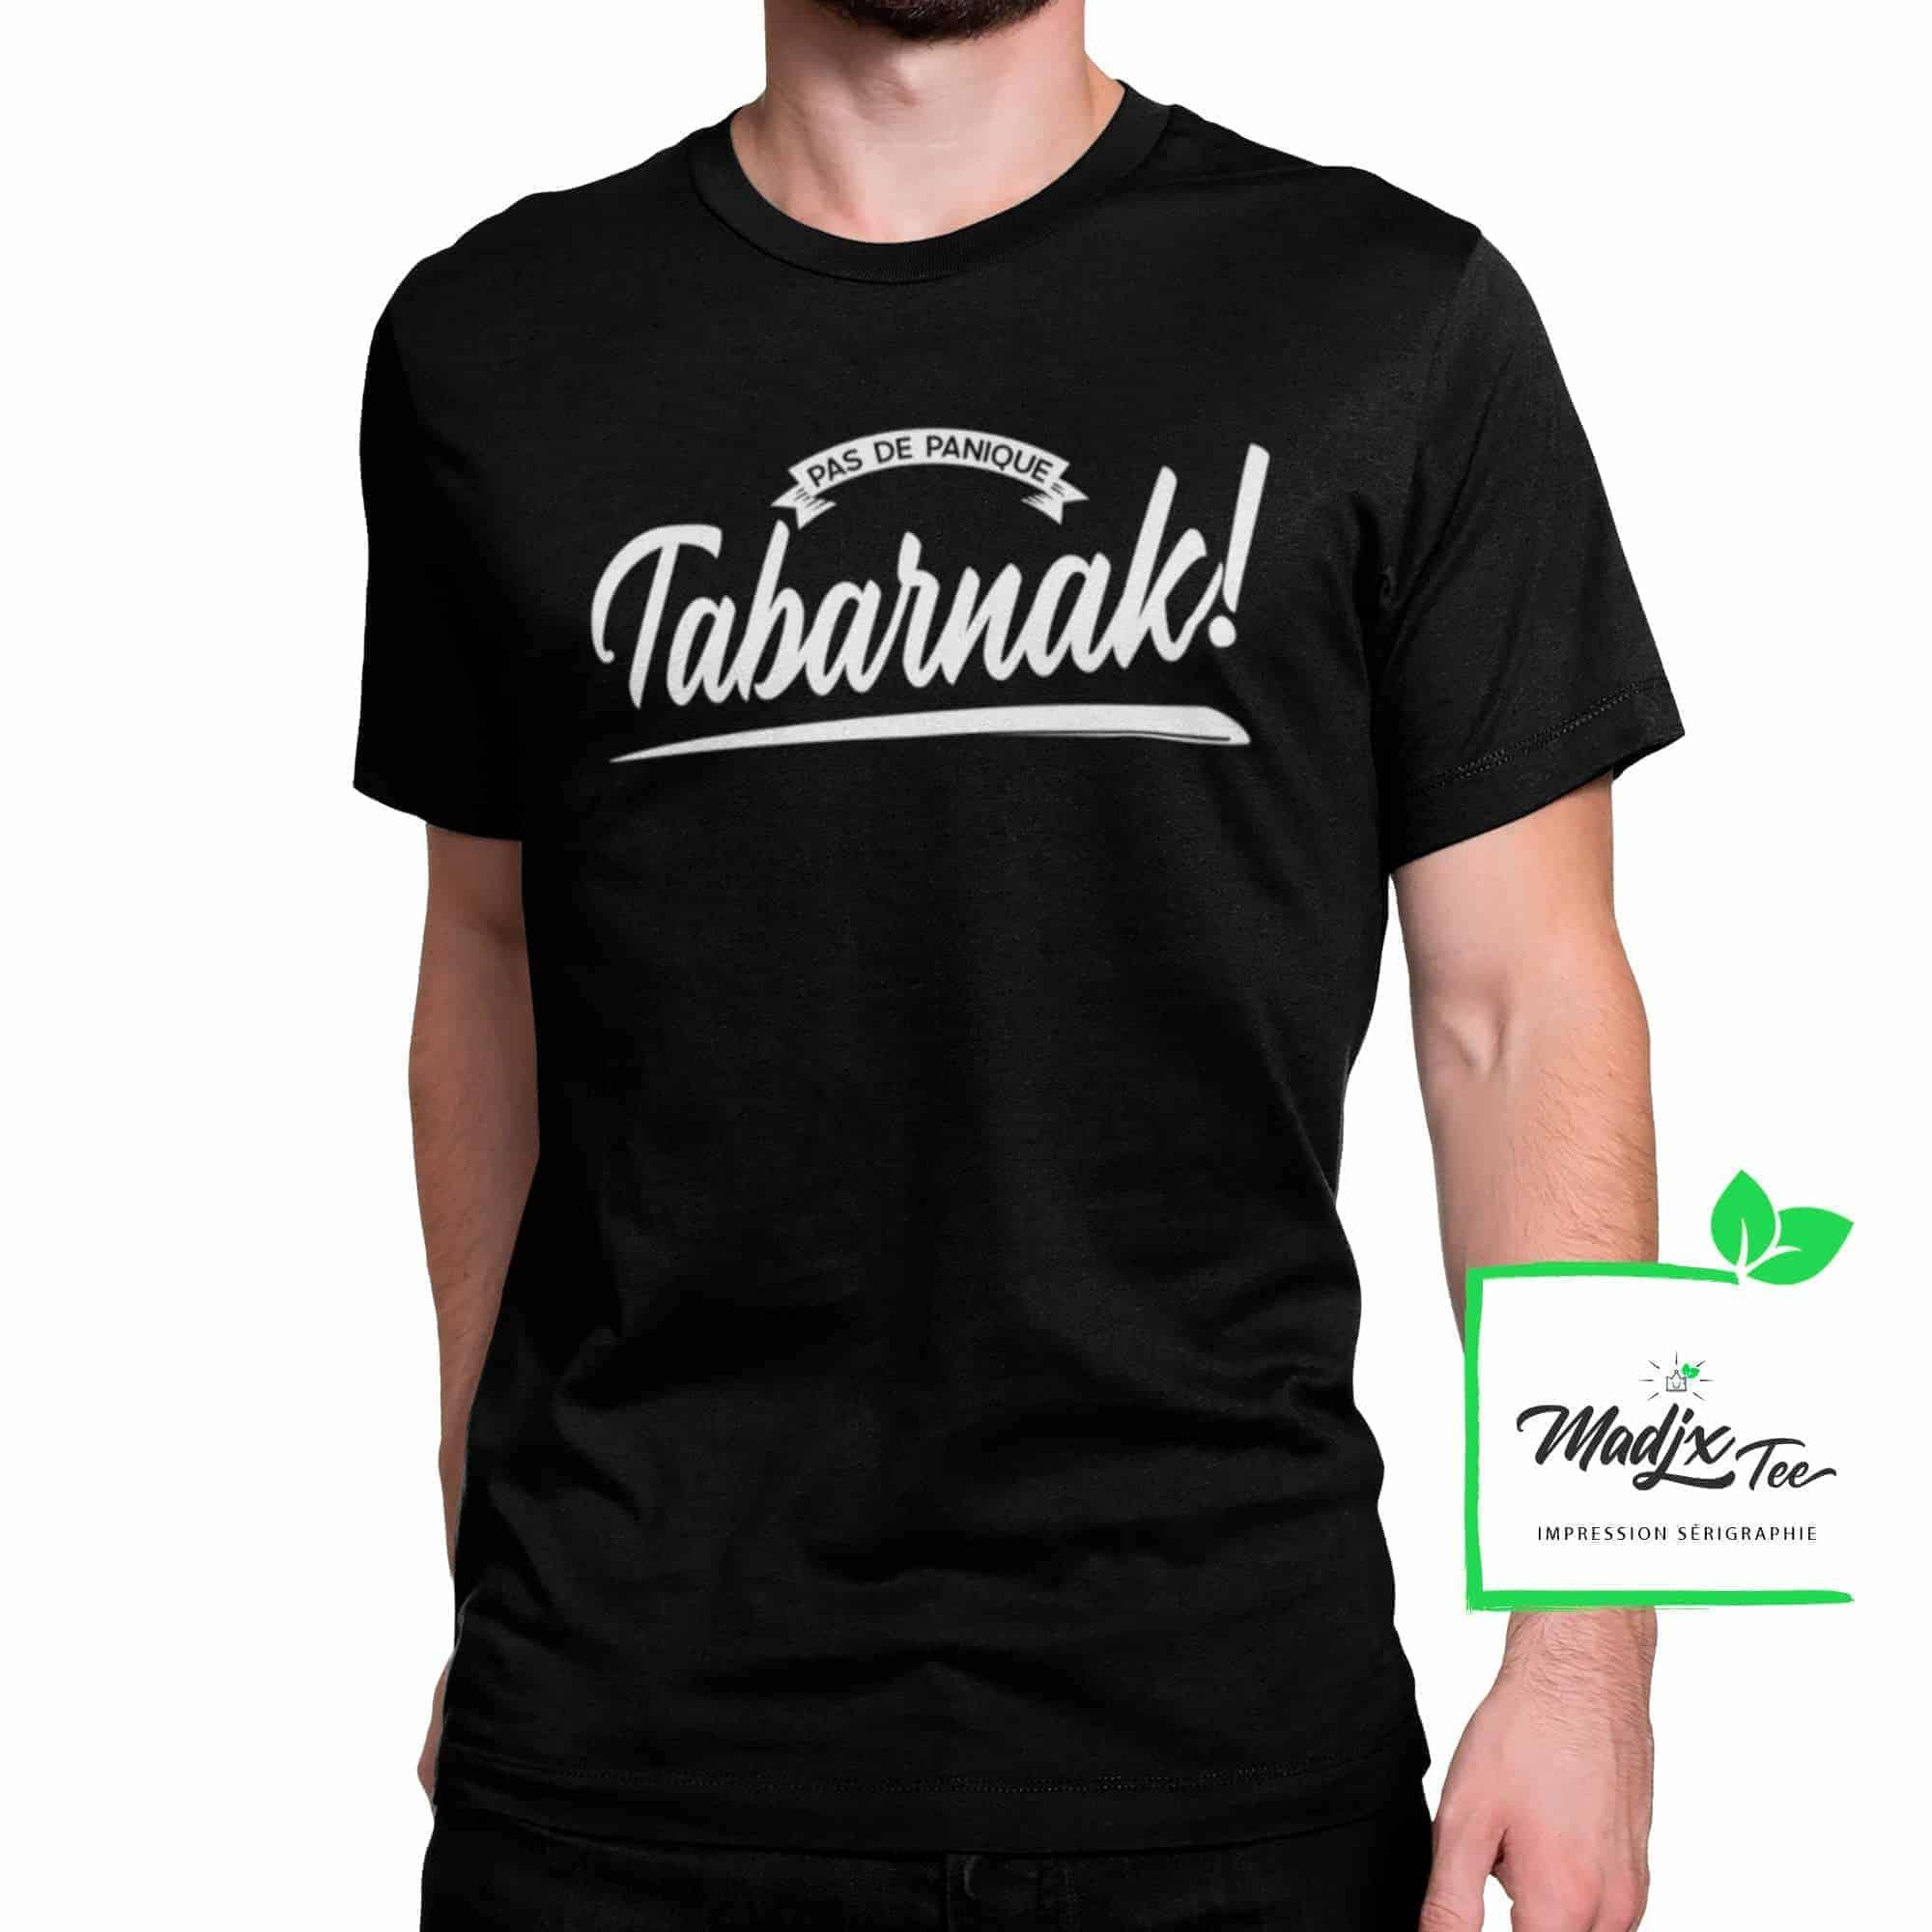 T-shirt Pas de Panique Tabarnak